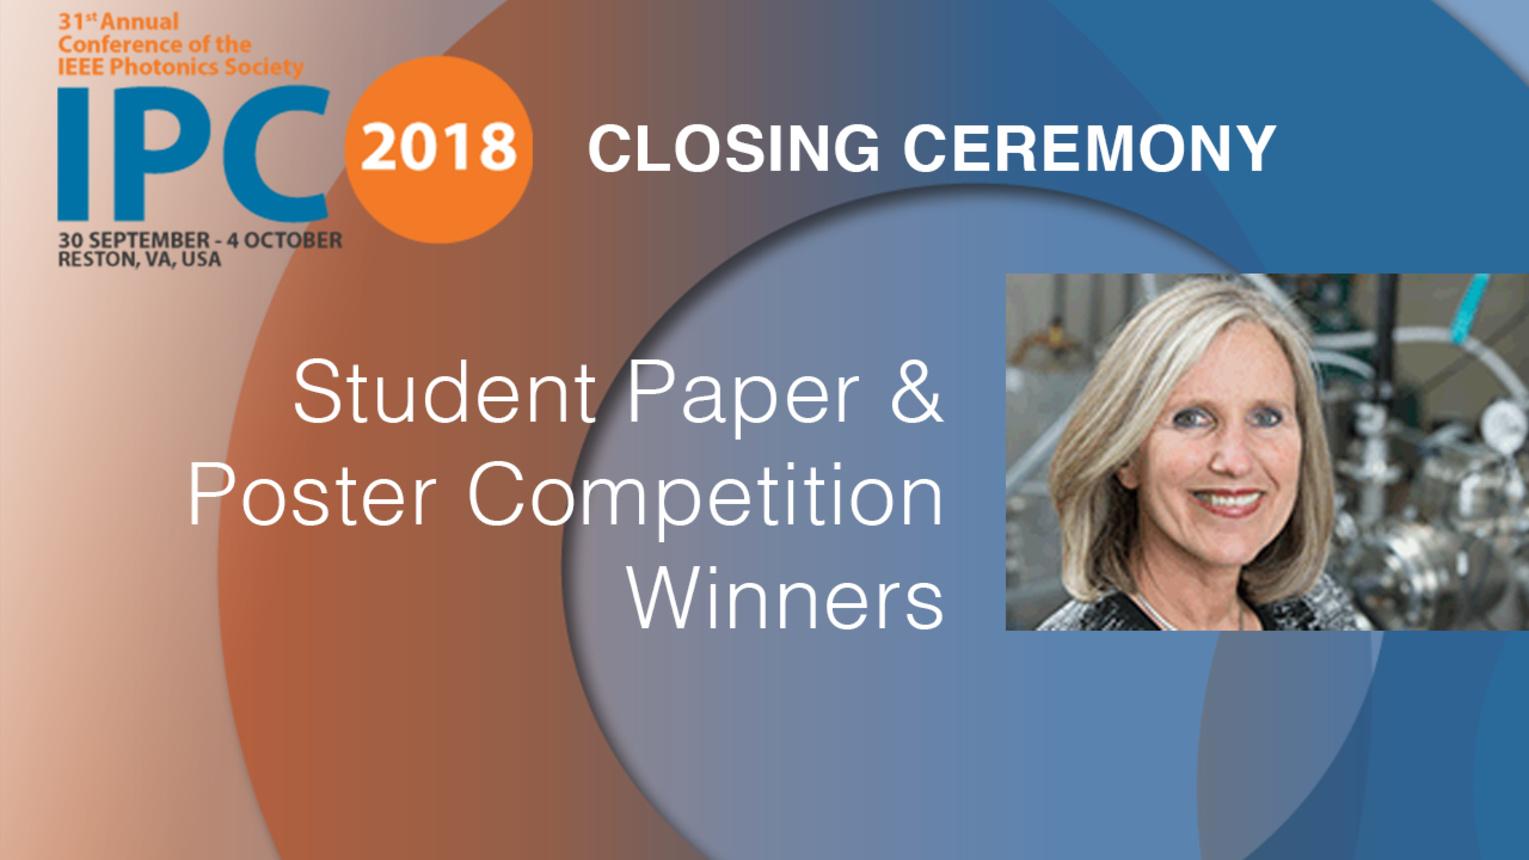 Student Paper and Poster Winners - Carmen Menoni - Closing Ceremony, IPC 2018